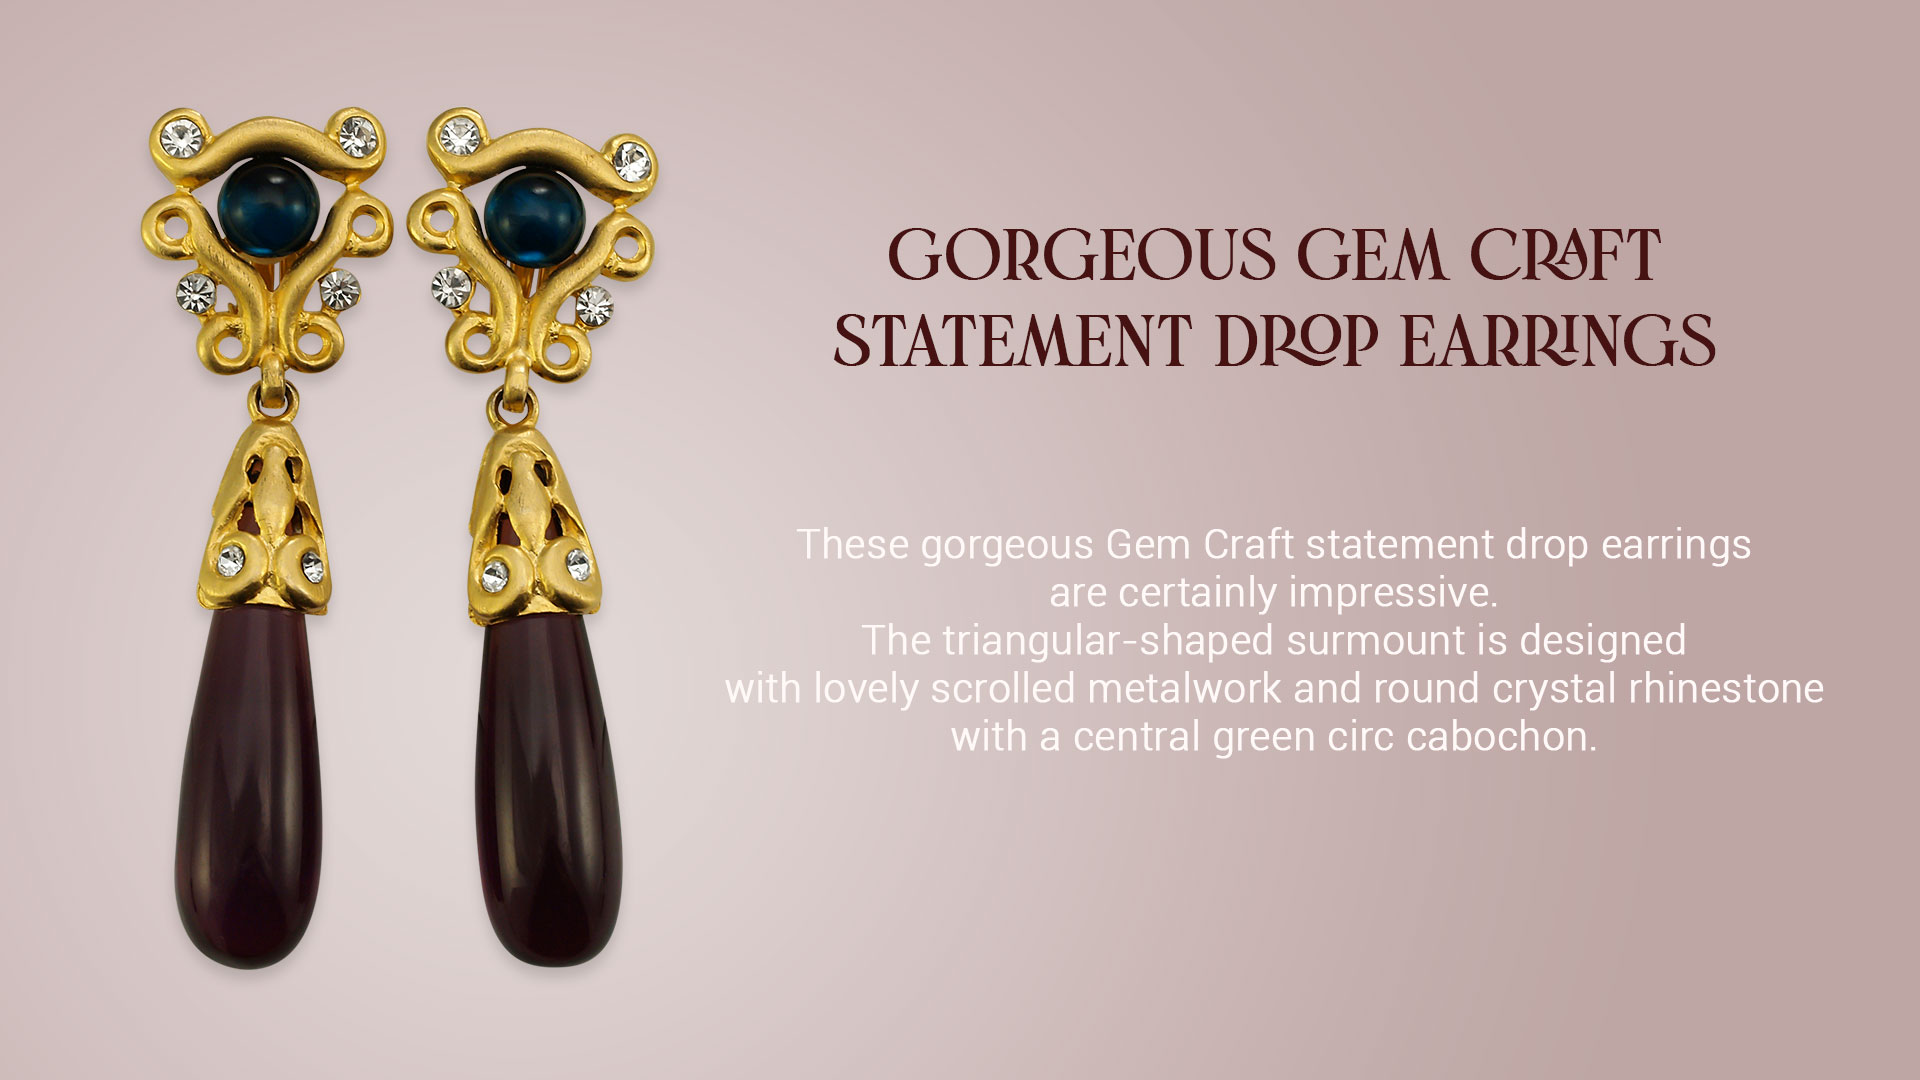 Gem-Craft-Statement-Drop-Earrings